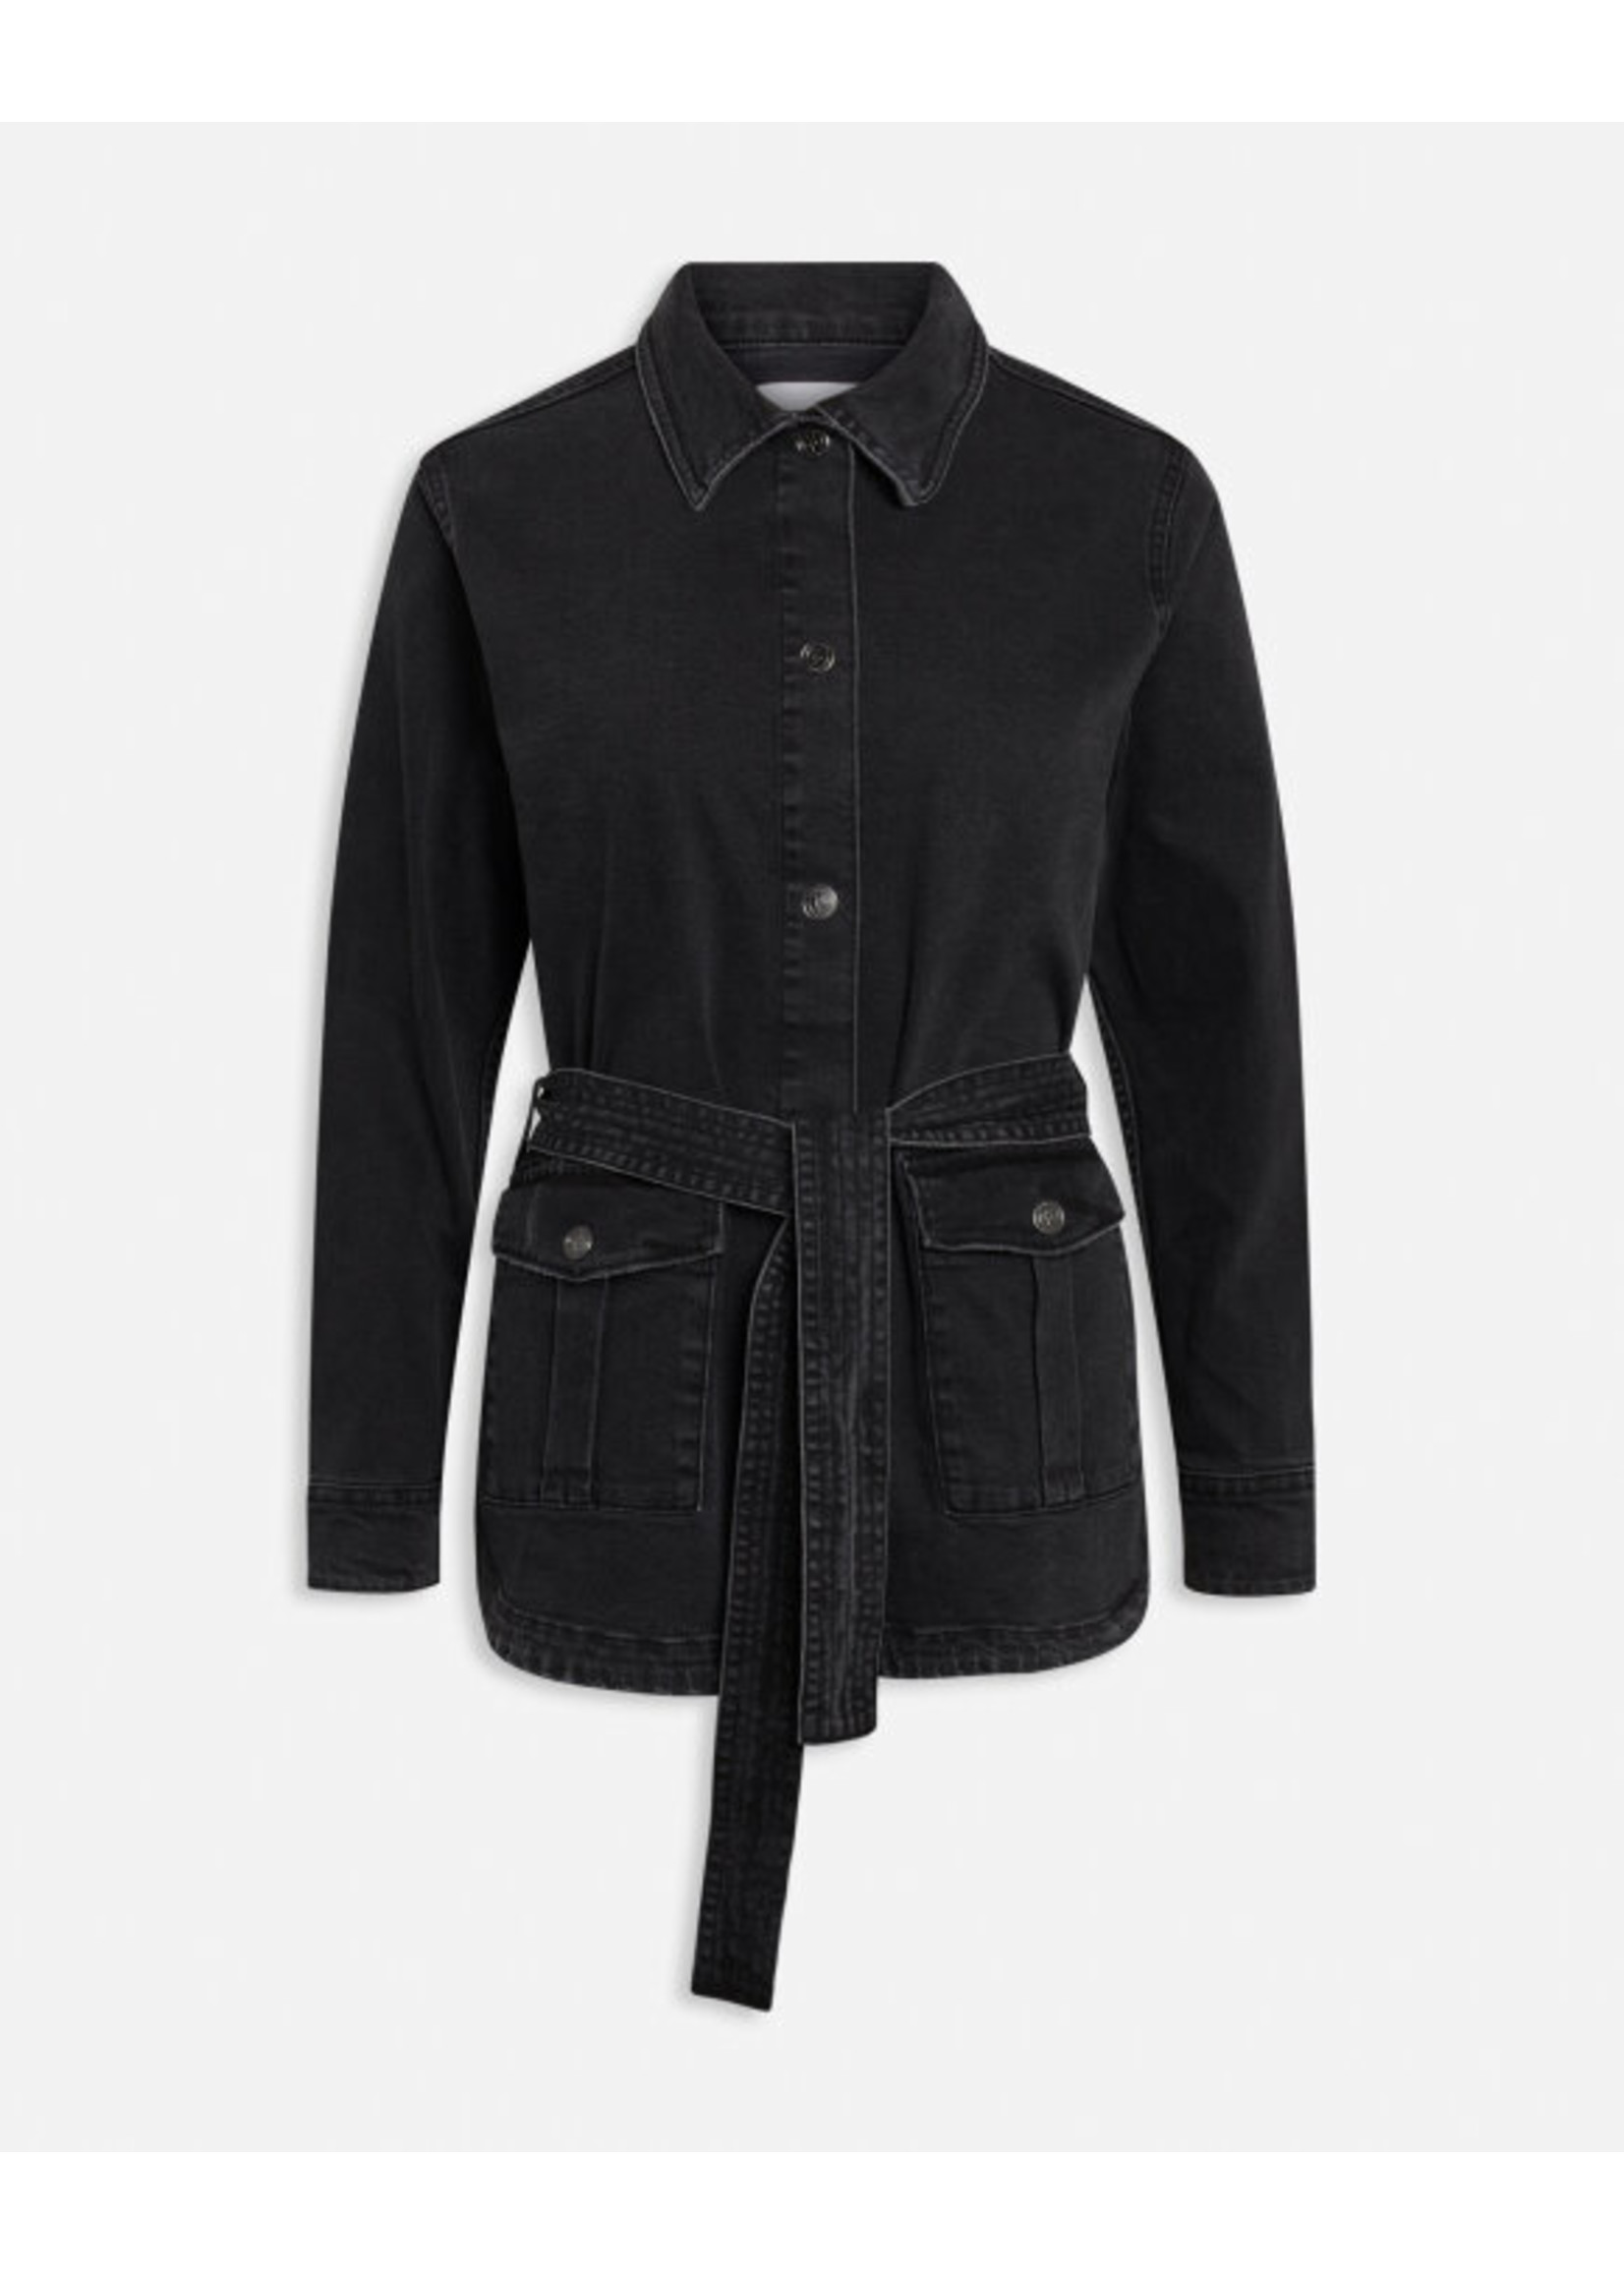 sisters point Black jeans jacket